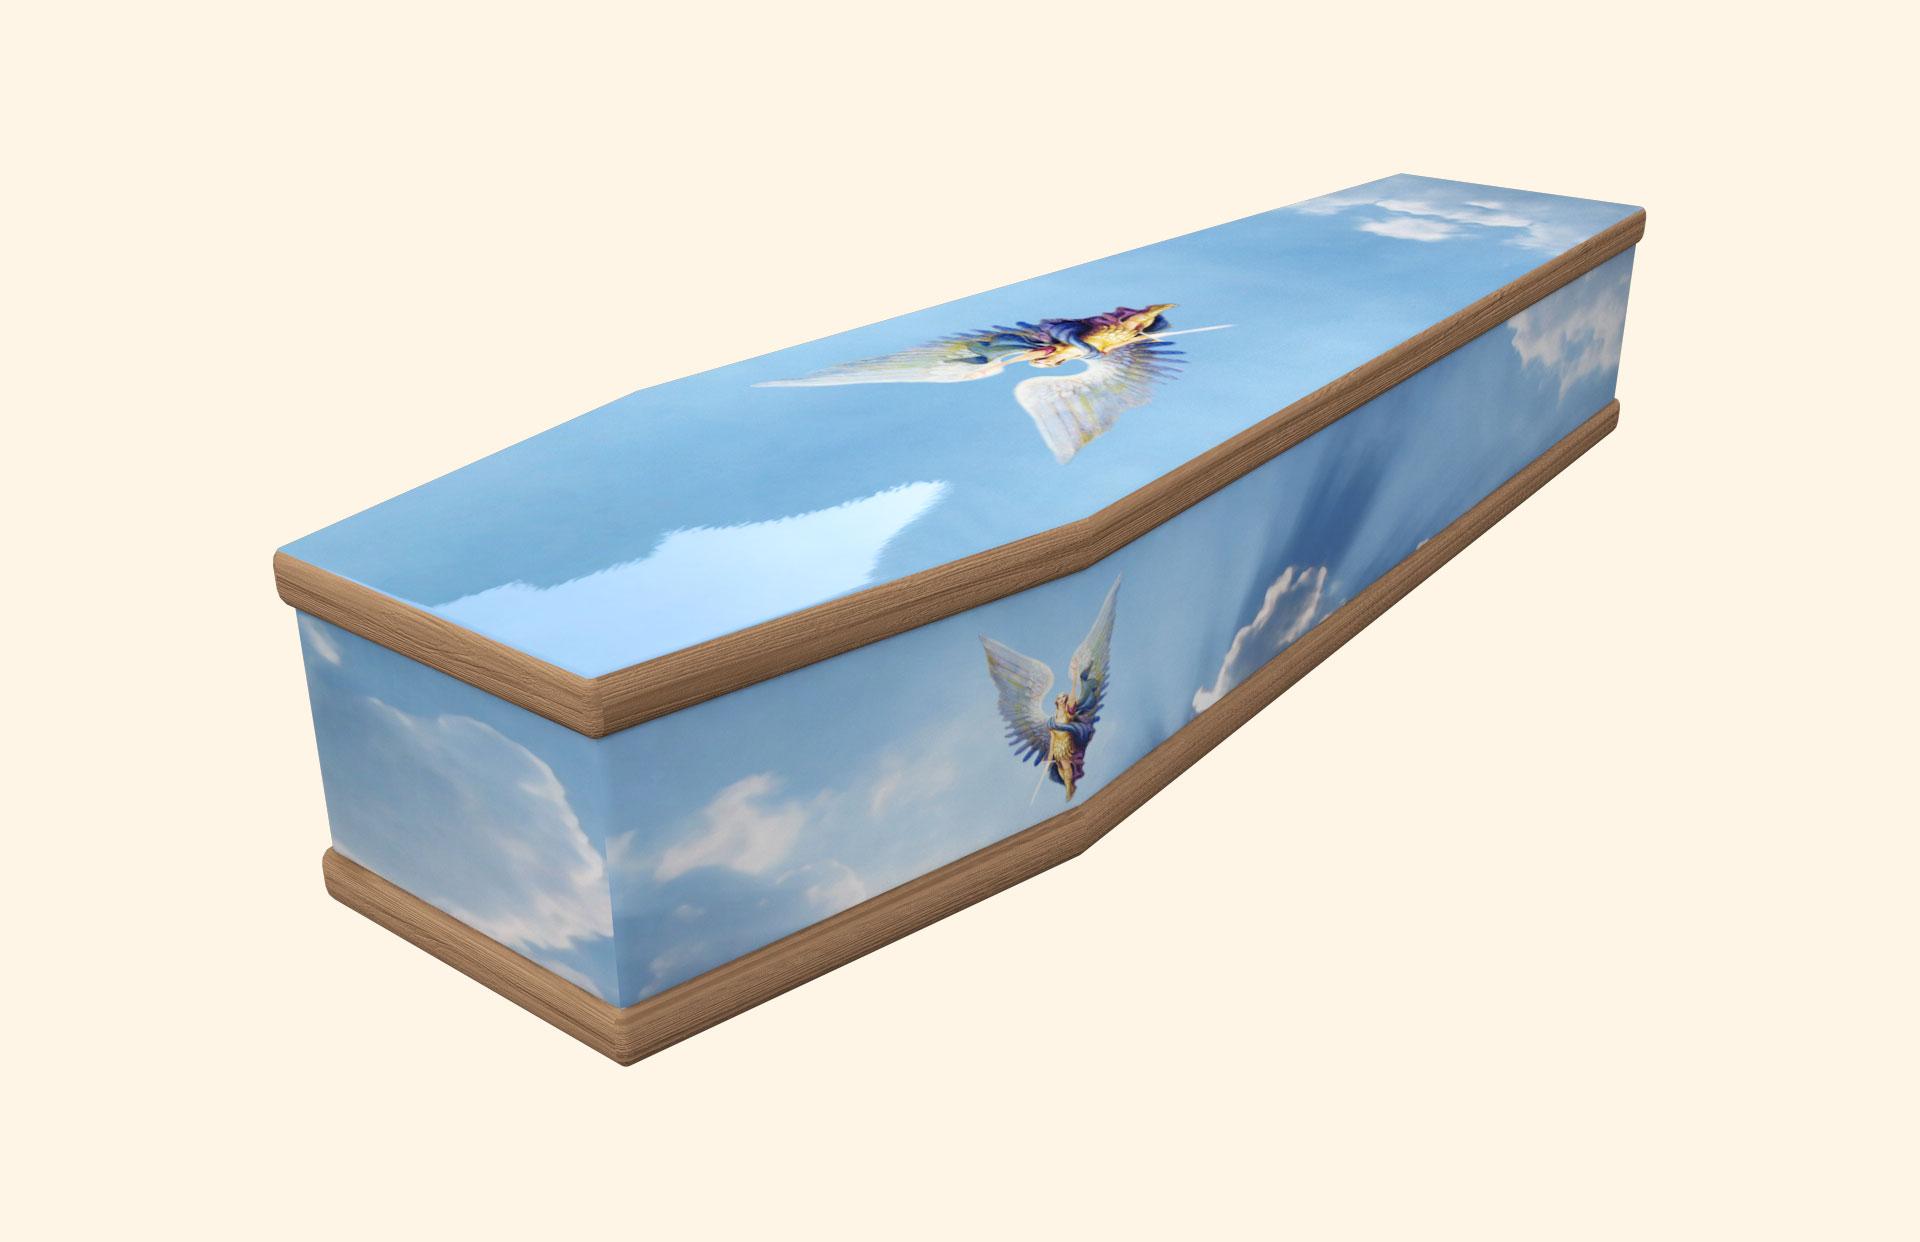 Heavenly Archangel Classic coffin